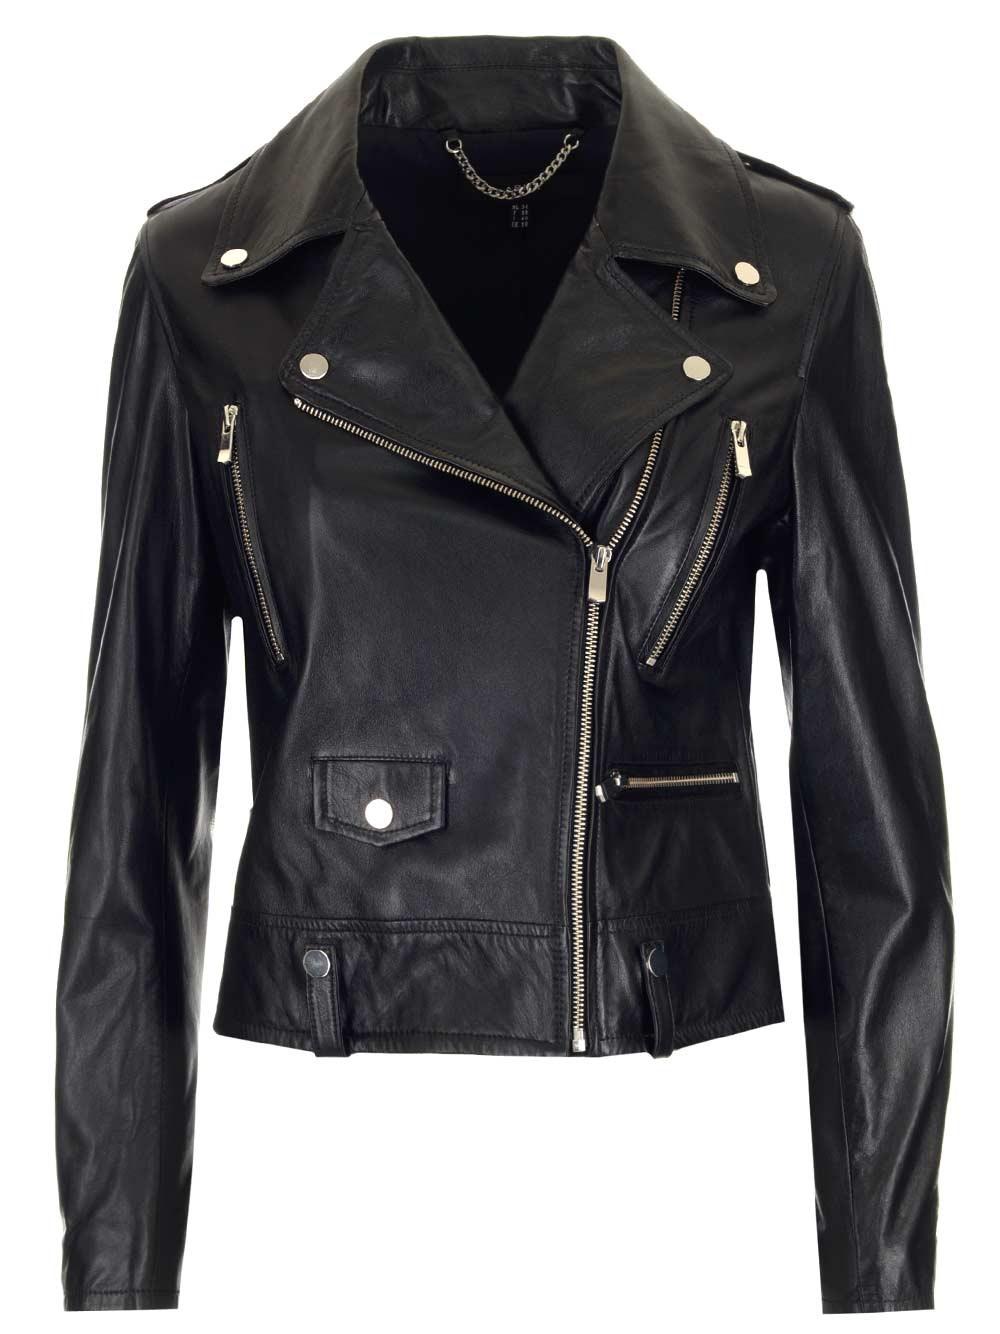 ARMA Classic Biker Jacket